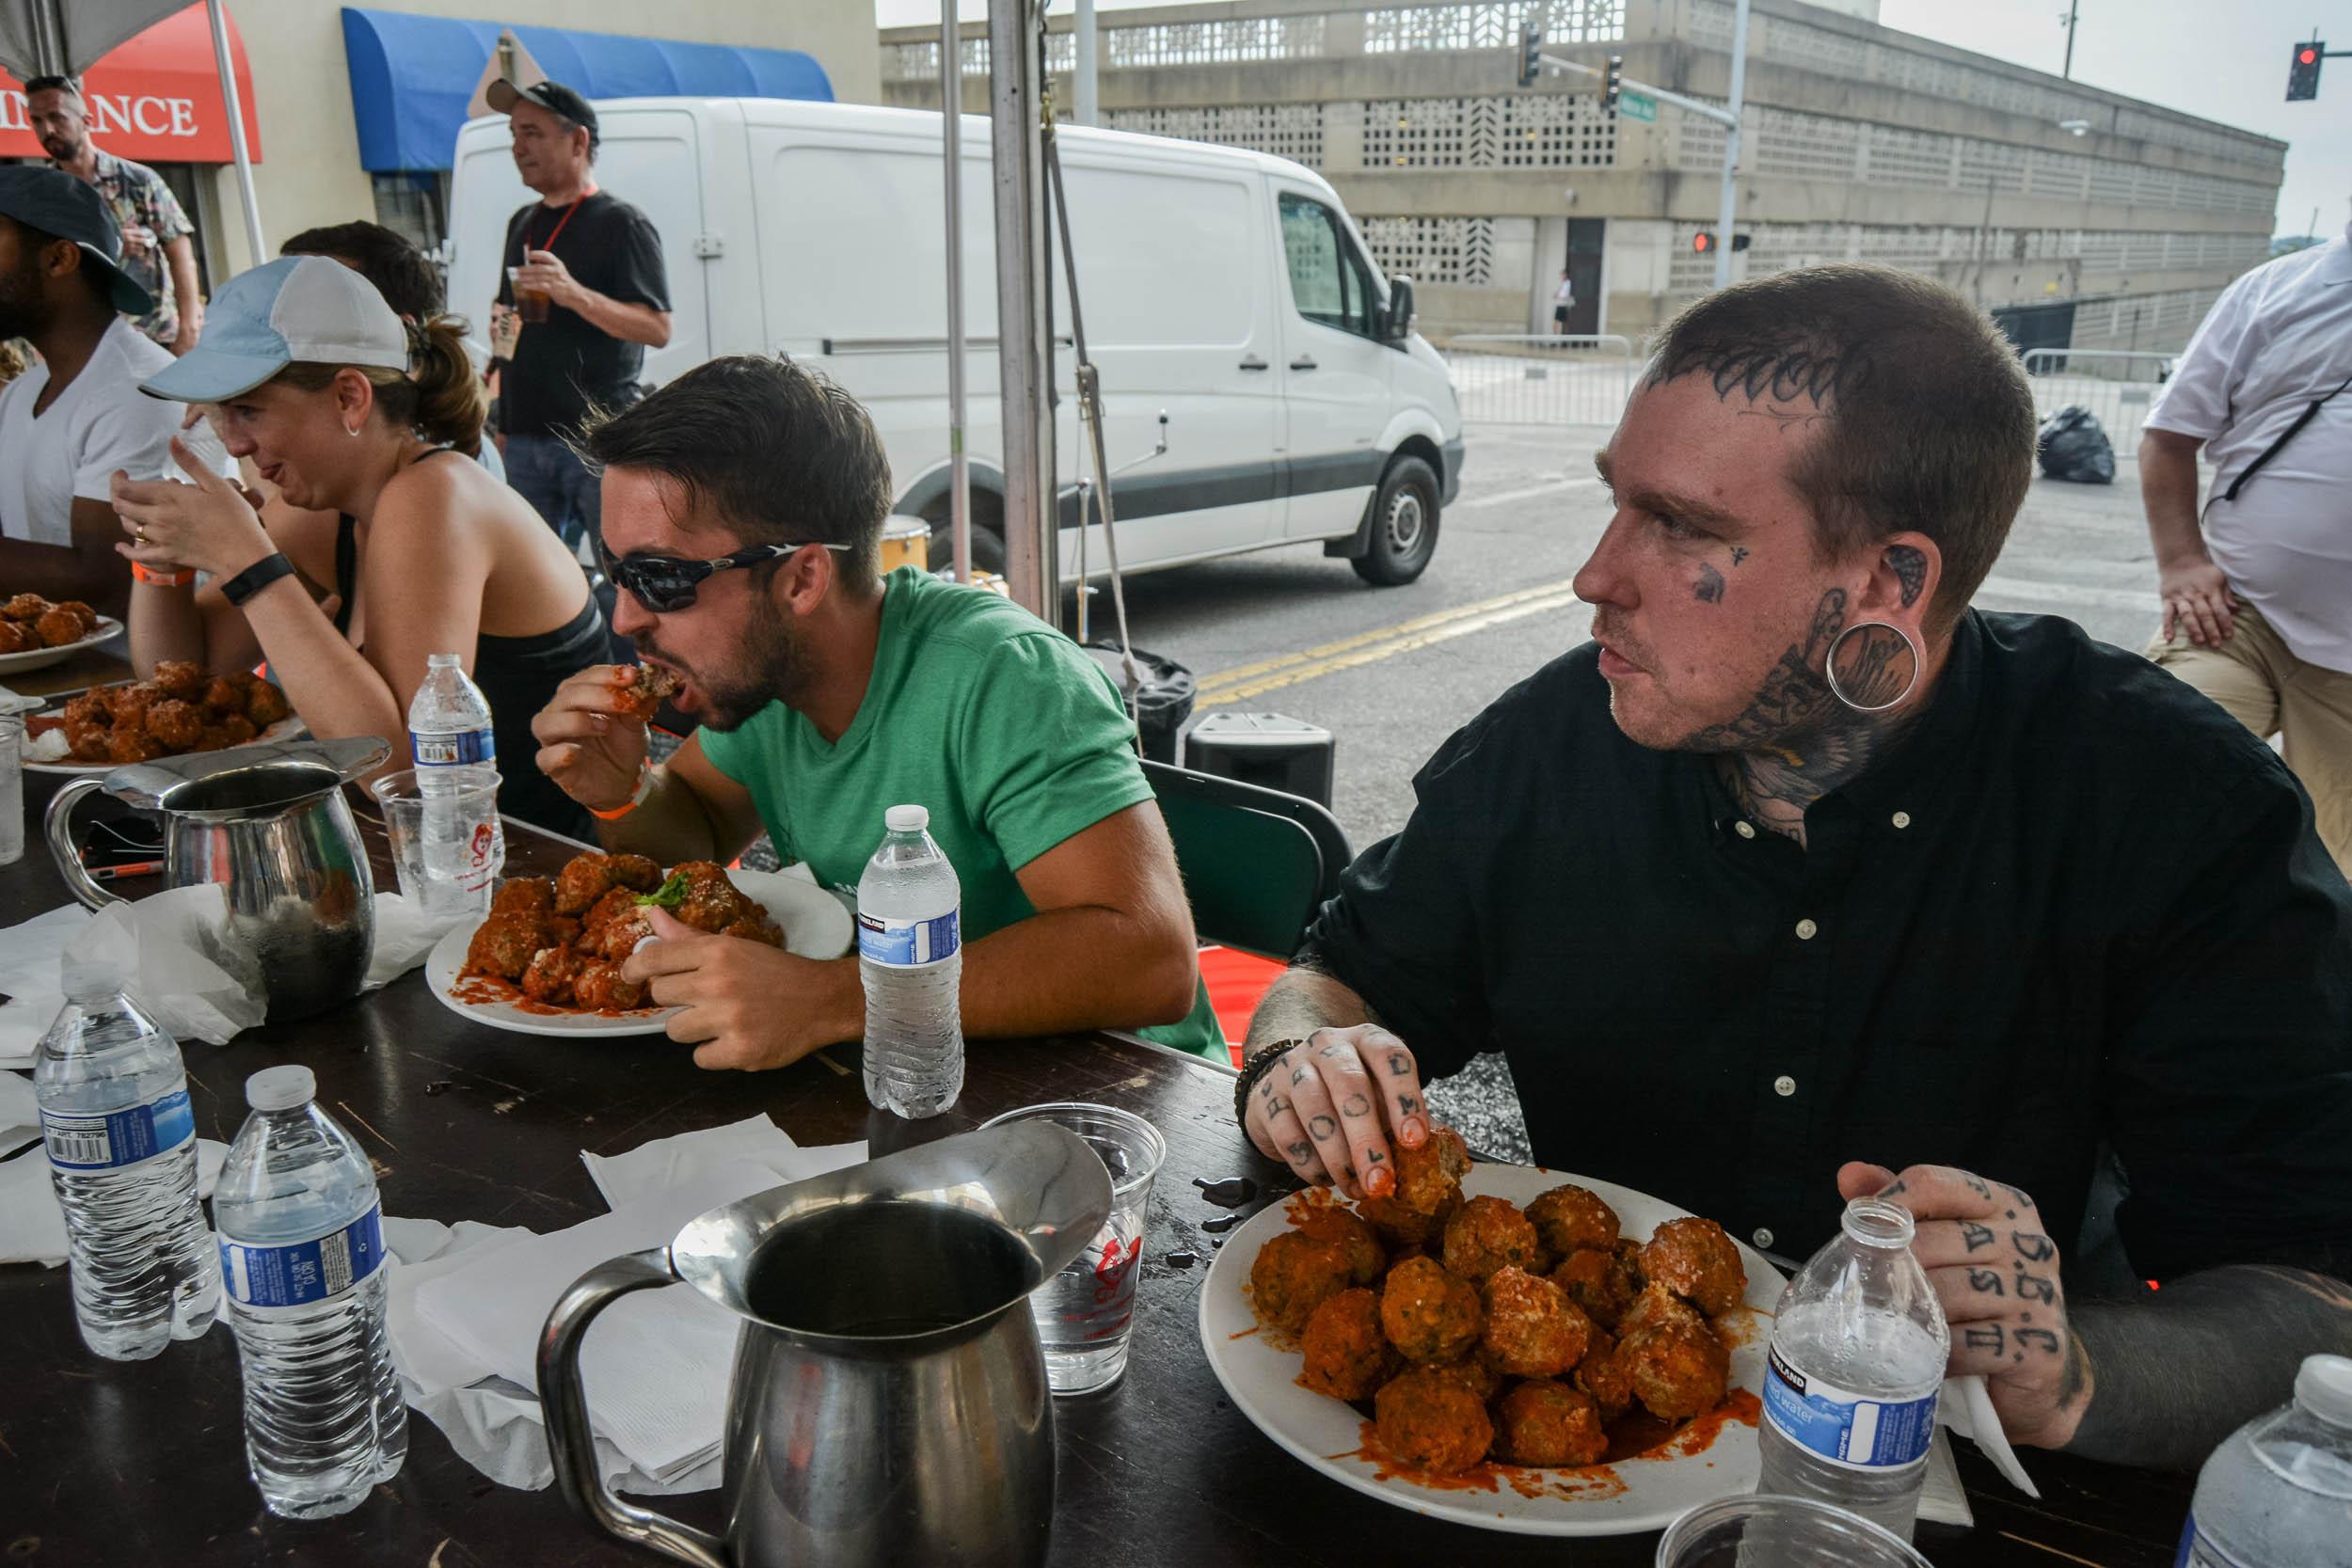 Monroe Avenue Festival Grandmas Meatball Eating Contest0035.jpg